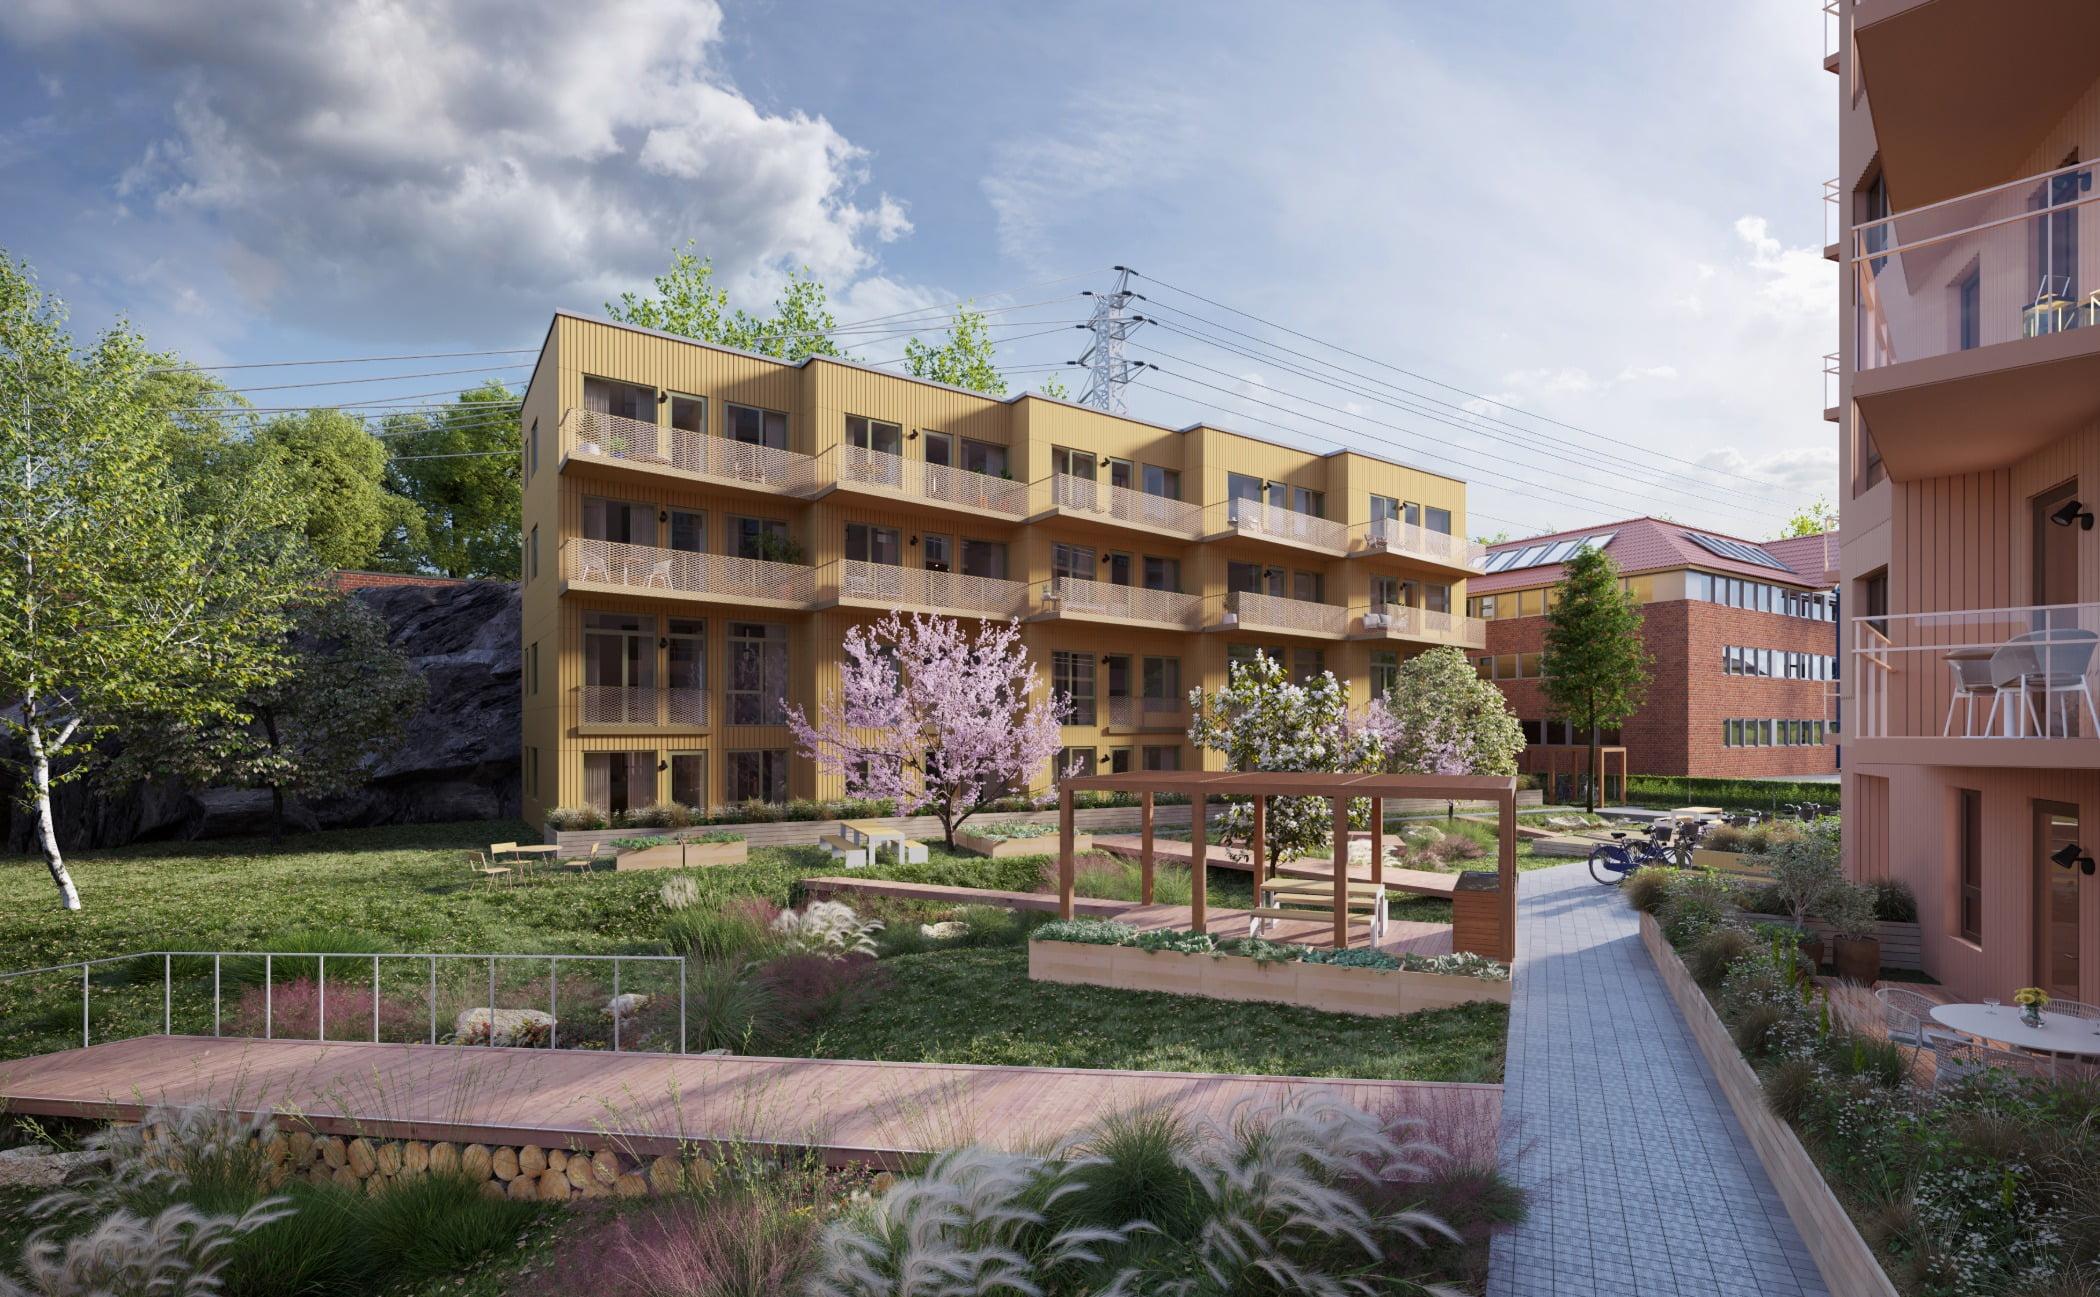 Urban design, Cloud, Sky, Plant, Building, Window, Condominium, Neighbourhood, Tree